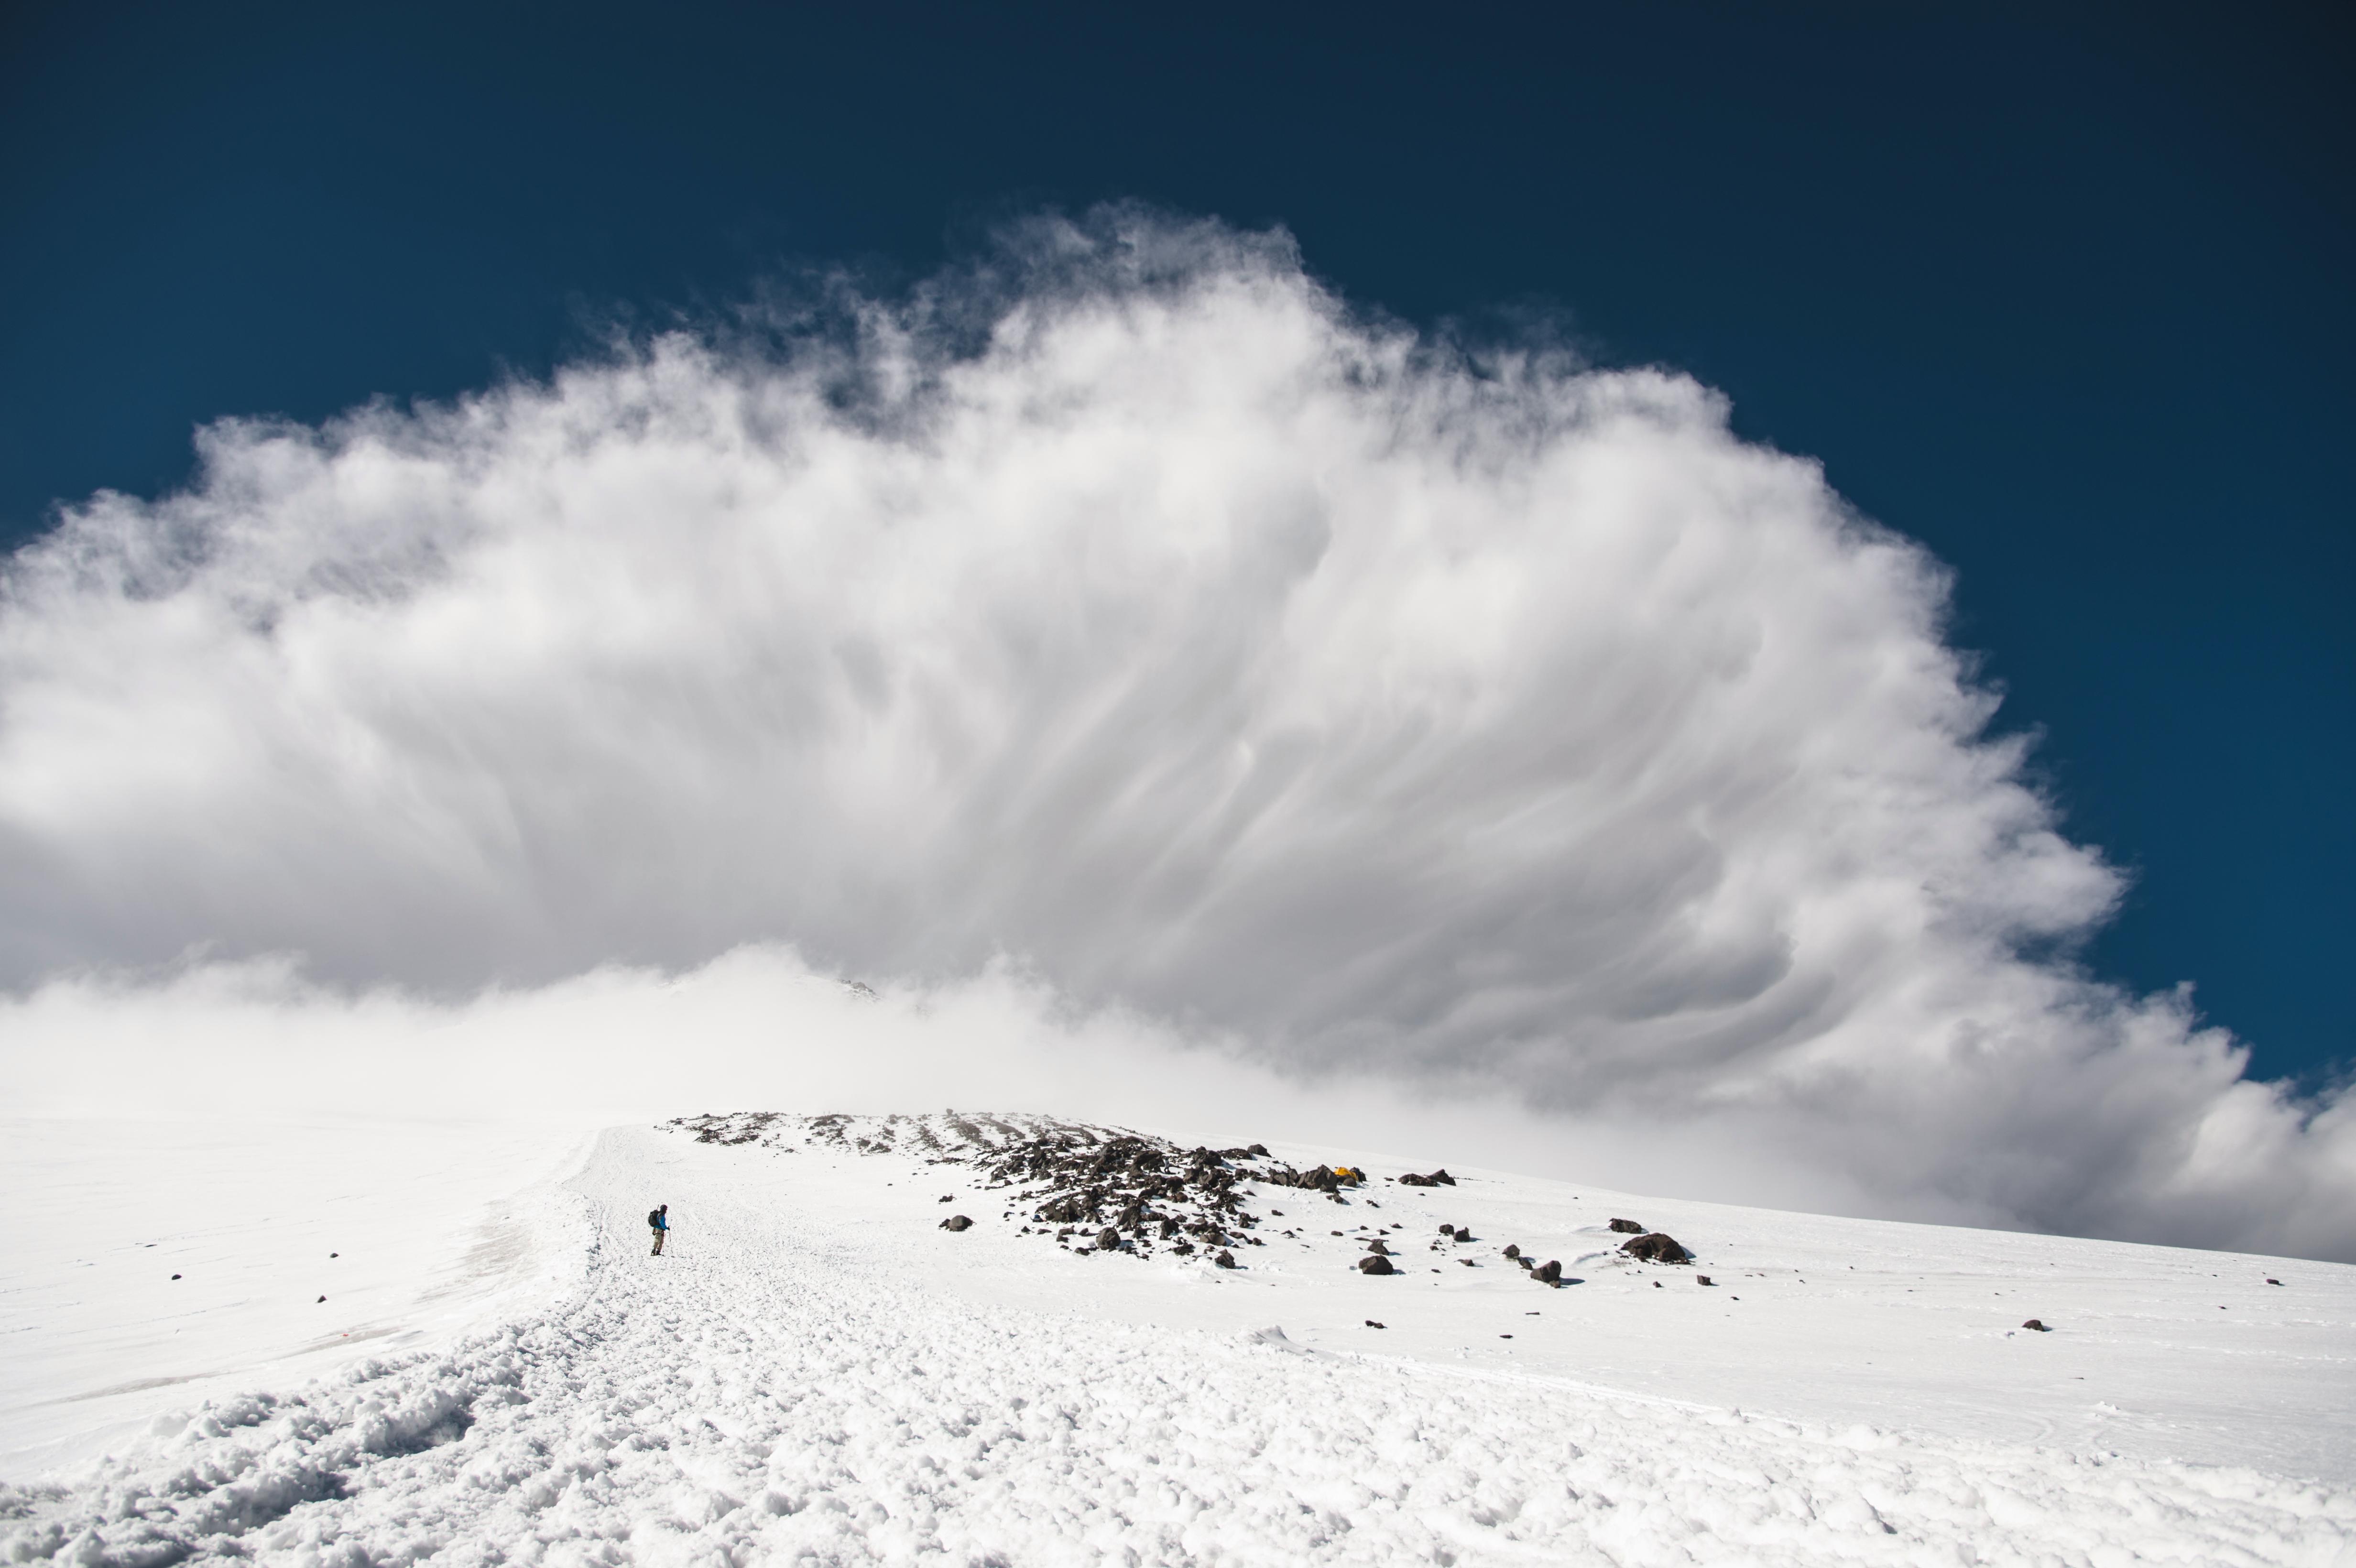 Трима испанци загинаха при лавина в  швейцарските Алпи